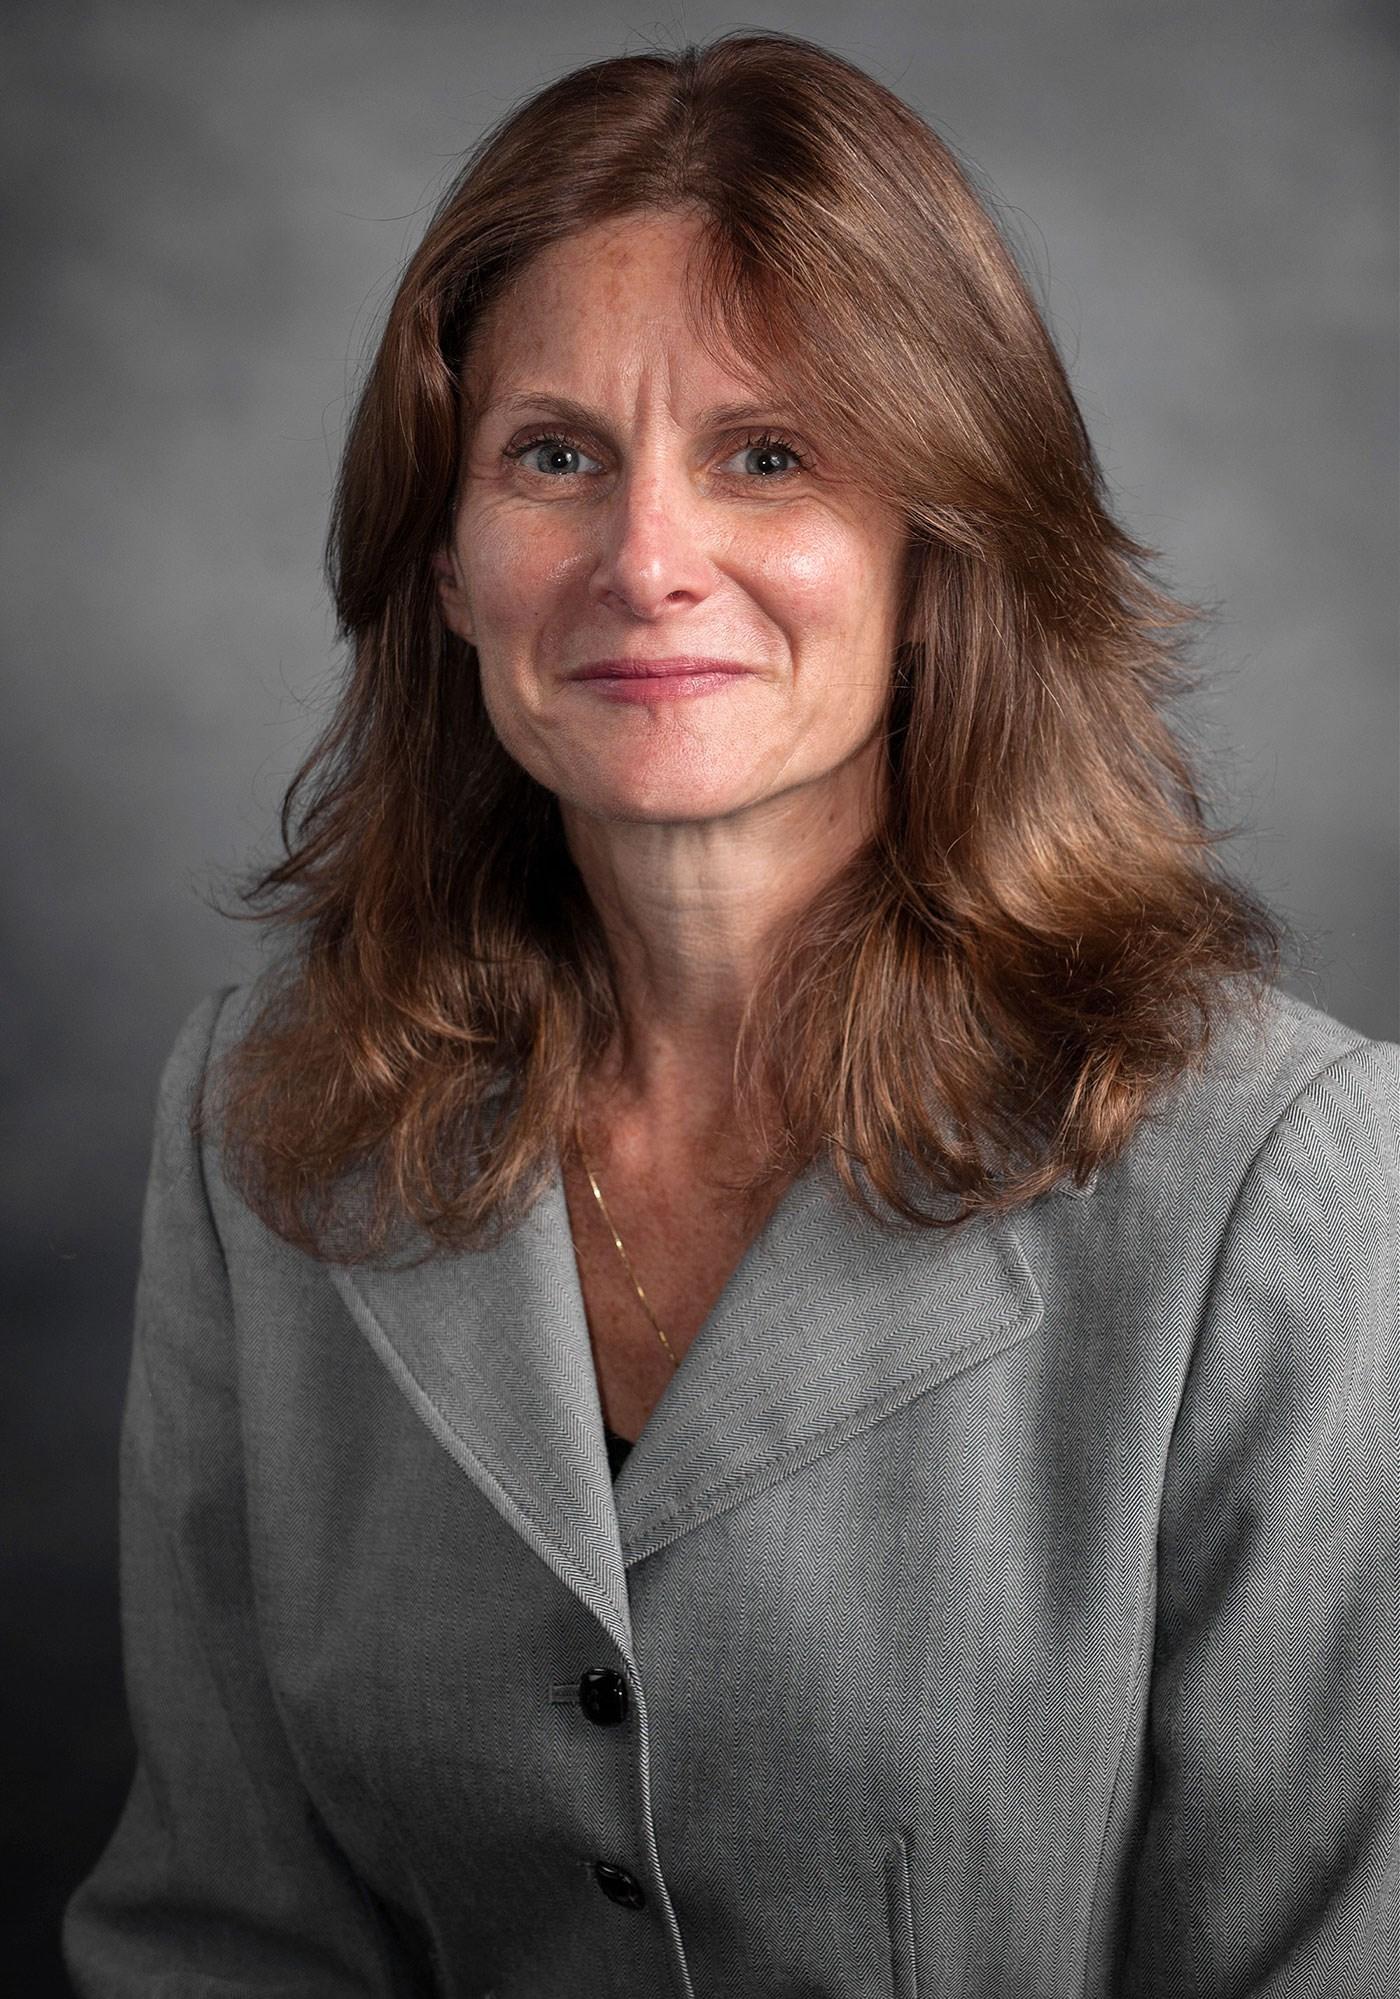 Maureen Howley | Chemical Engineering | UMass Lowell